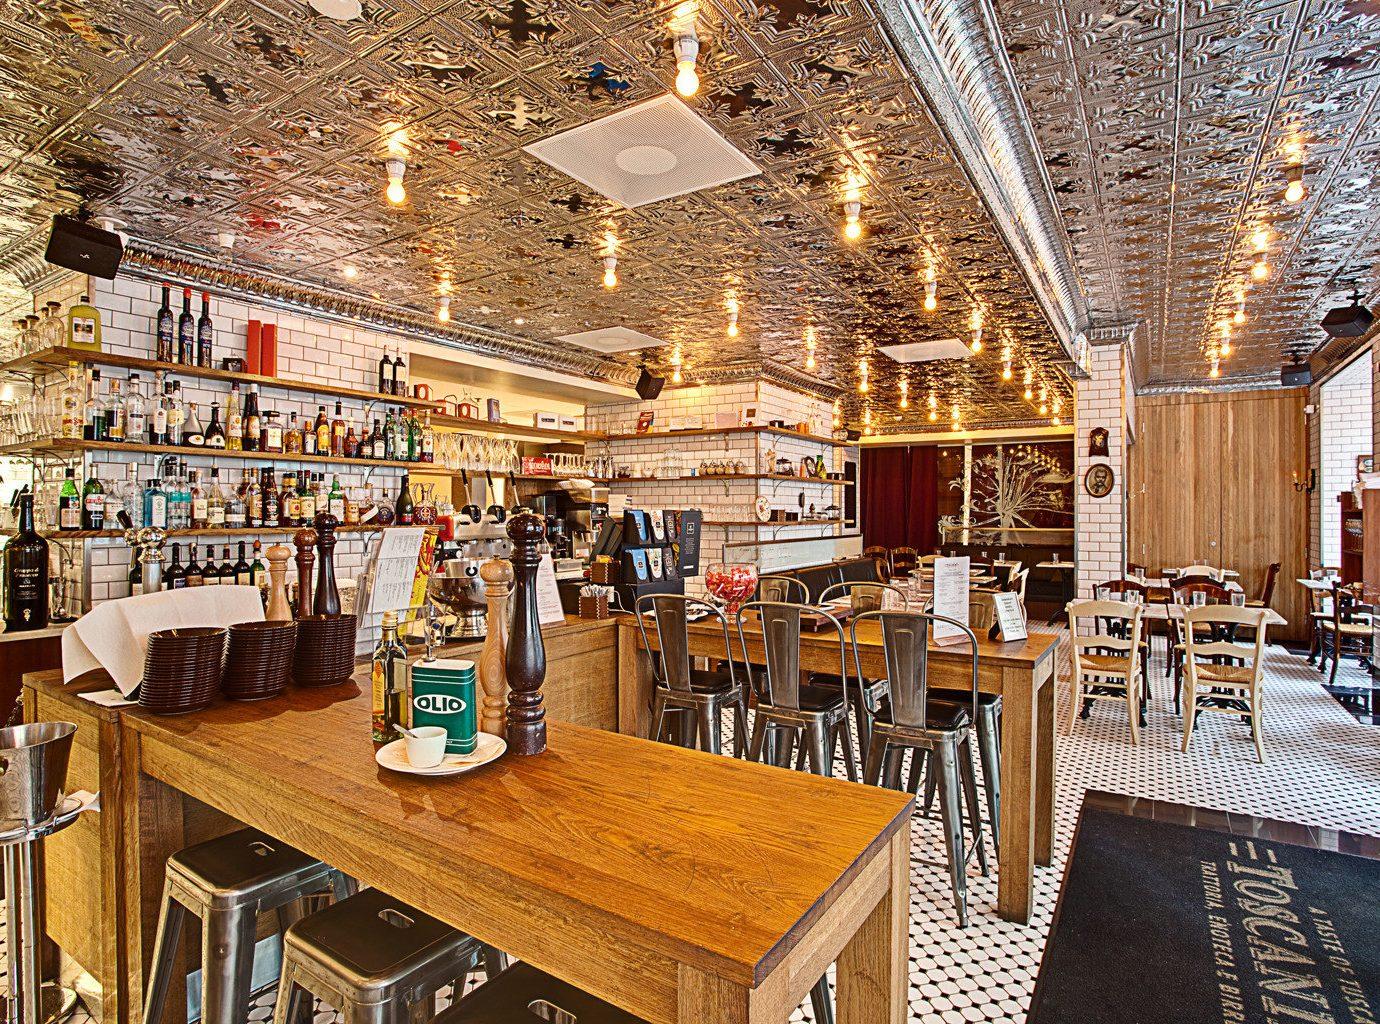 Bar City Design Dining Drink Eat Finland Hip Trip Ideas indoor table floor chair building restaurant tavern estate meal